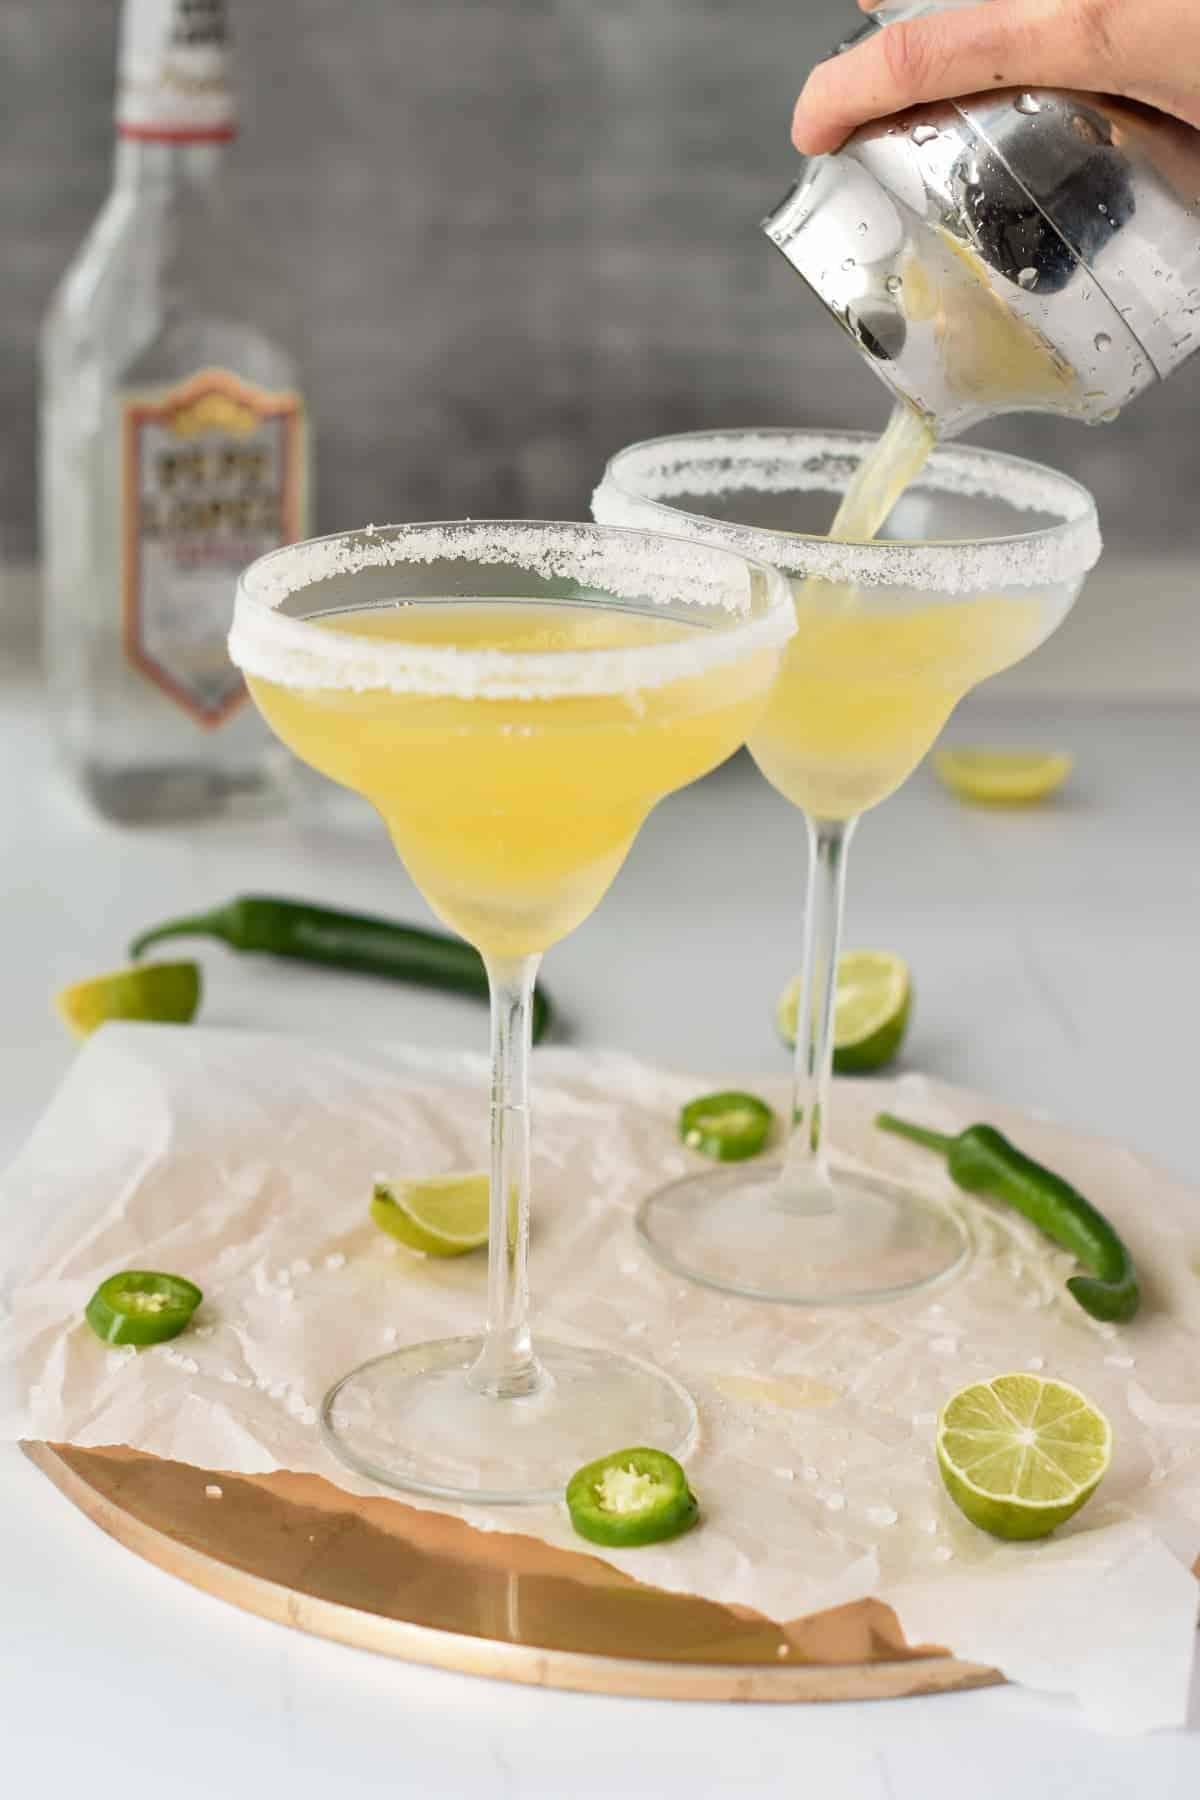 Spicy Skinny Margarita Poured in Margarita Glasses